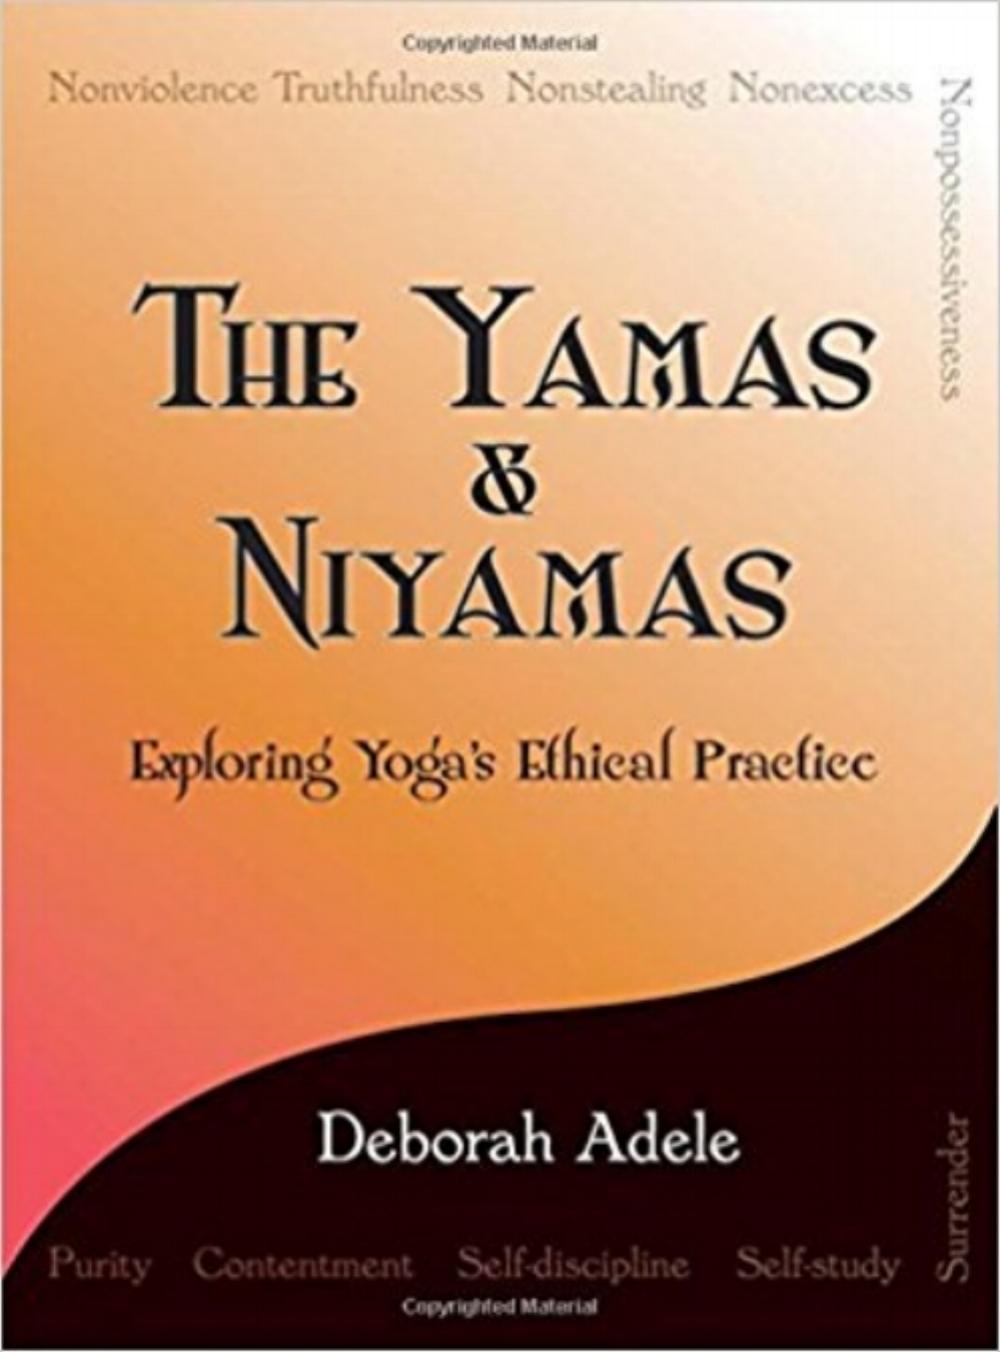 The Yamas & Niyamas Book.jpg